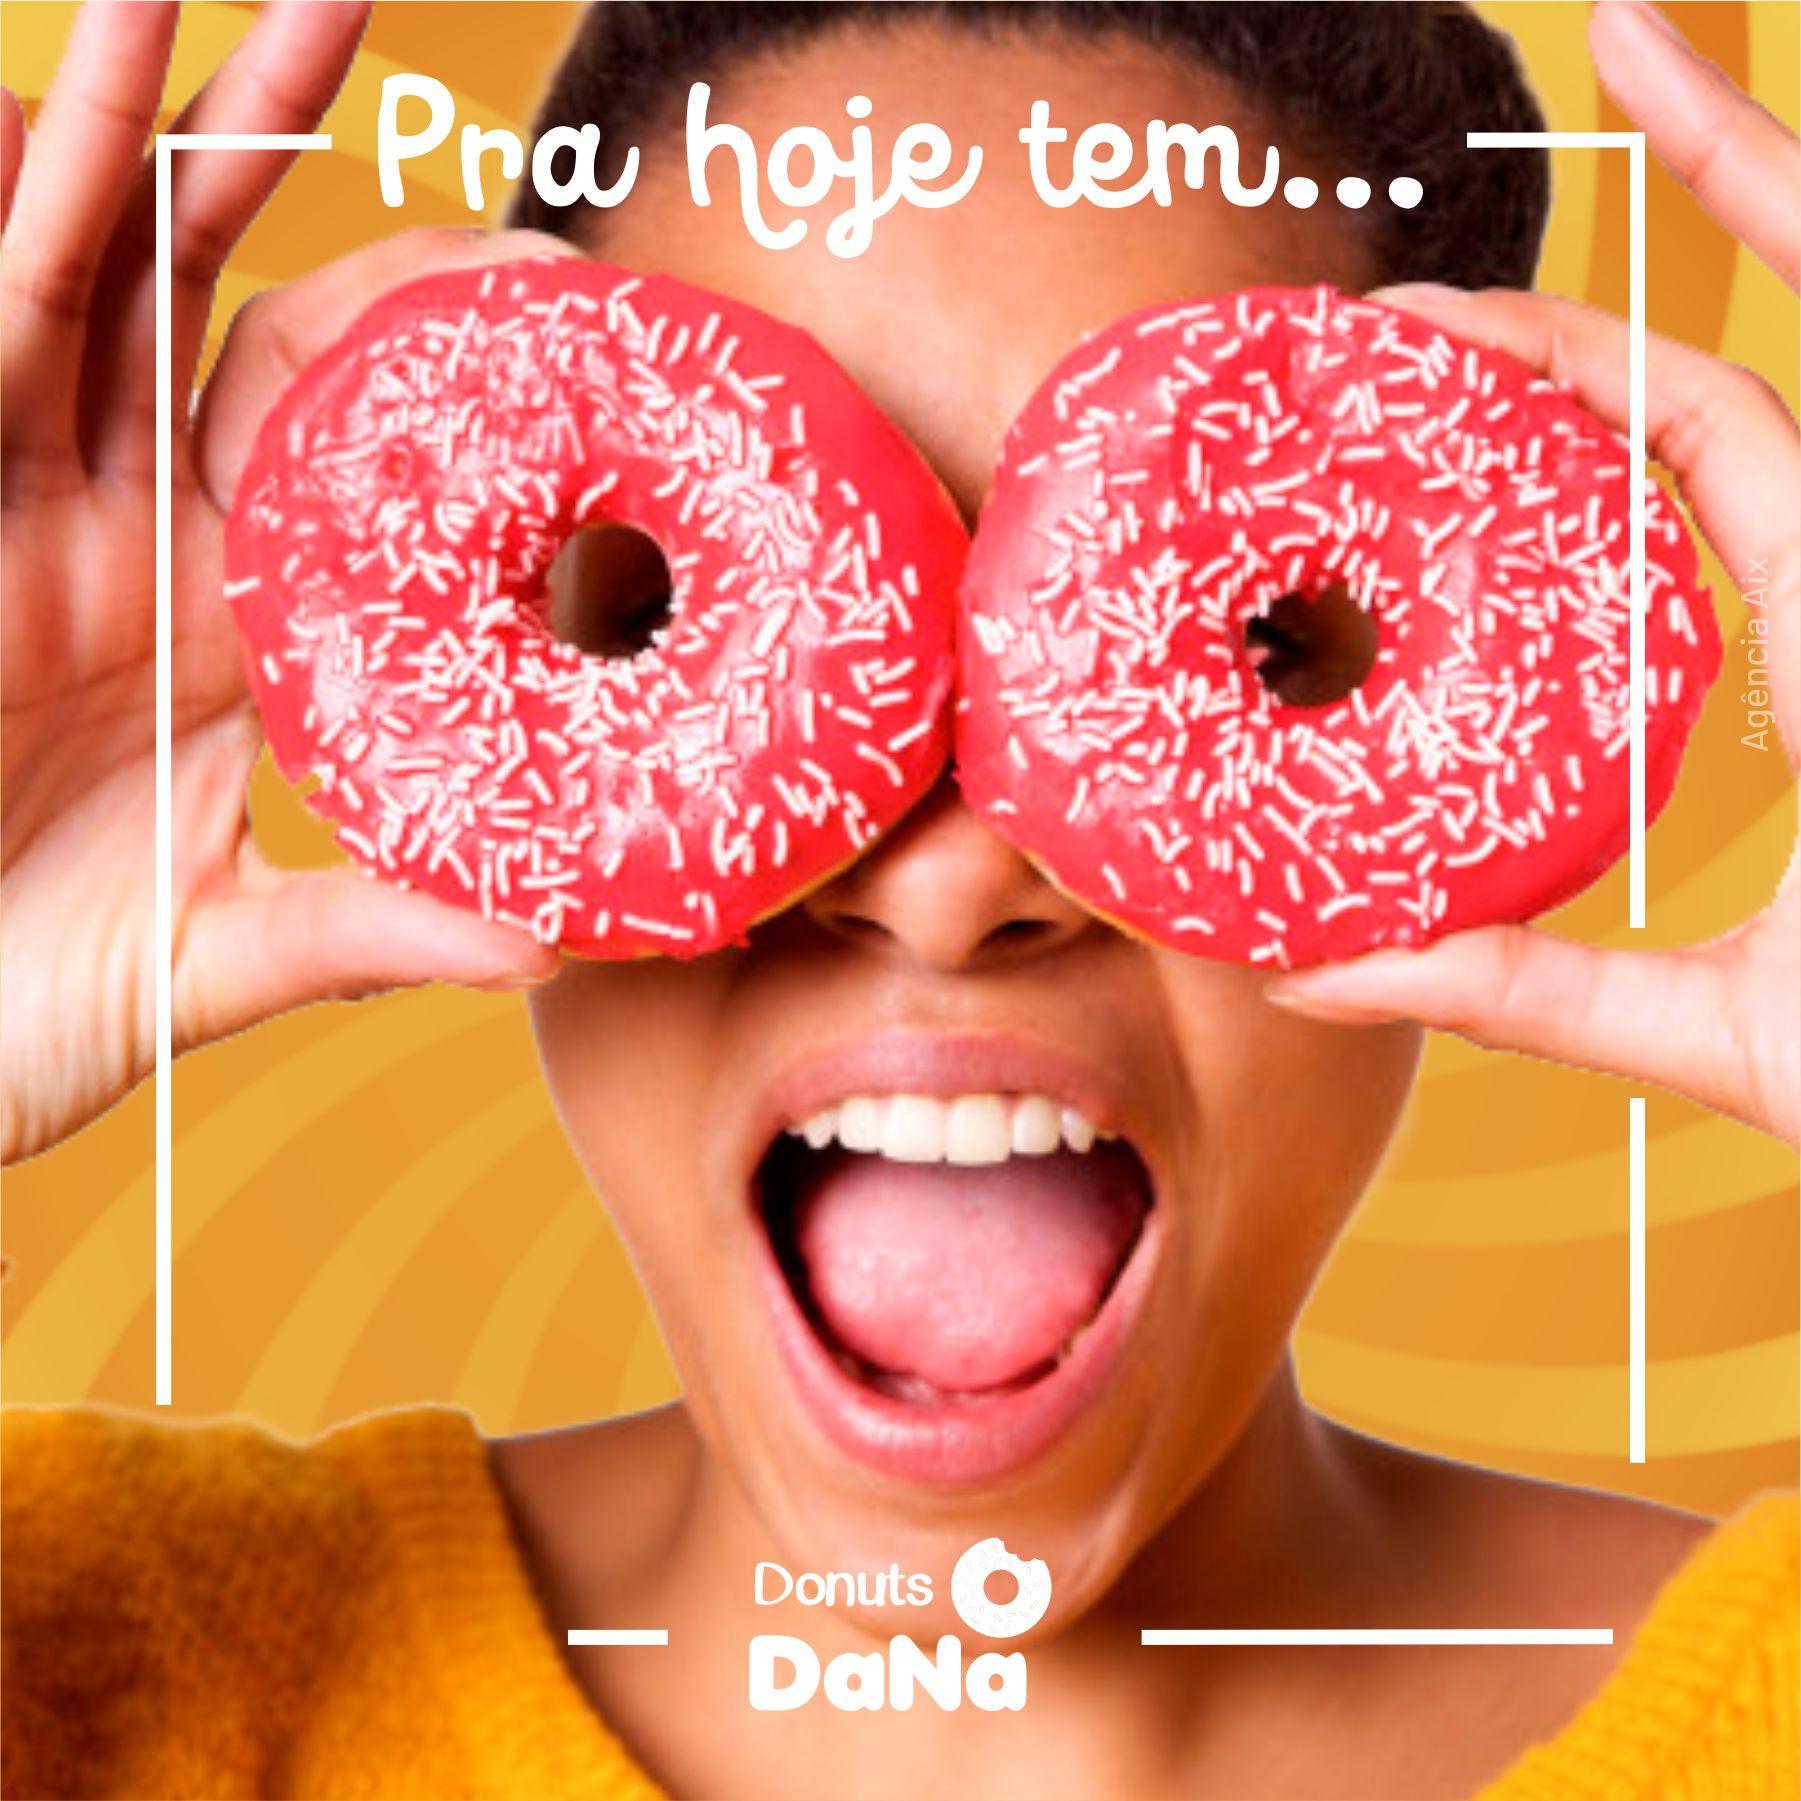 Donuts DaNa